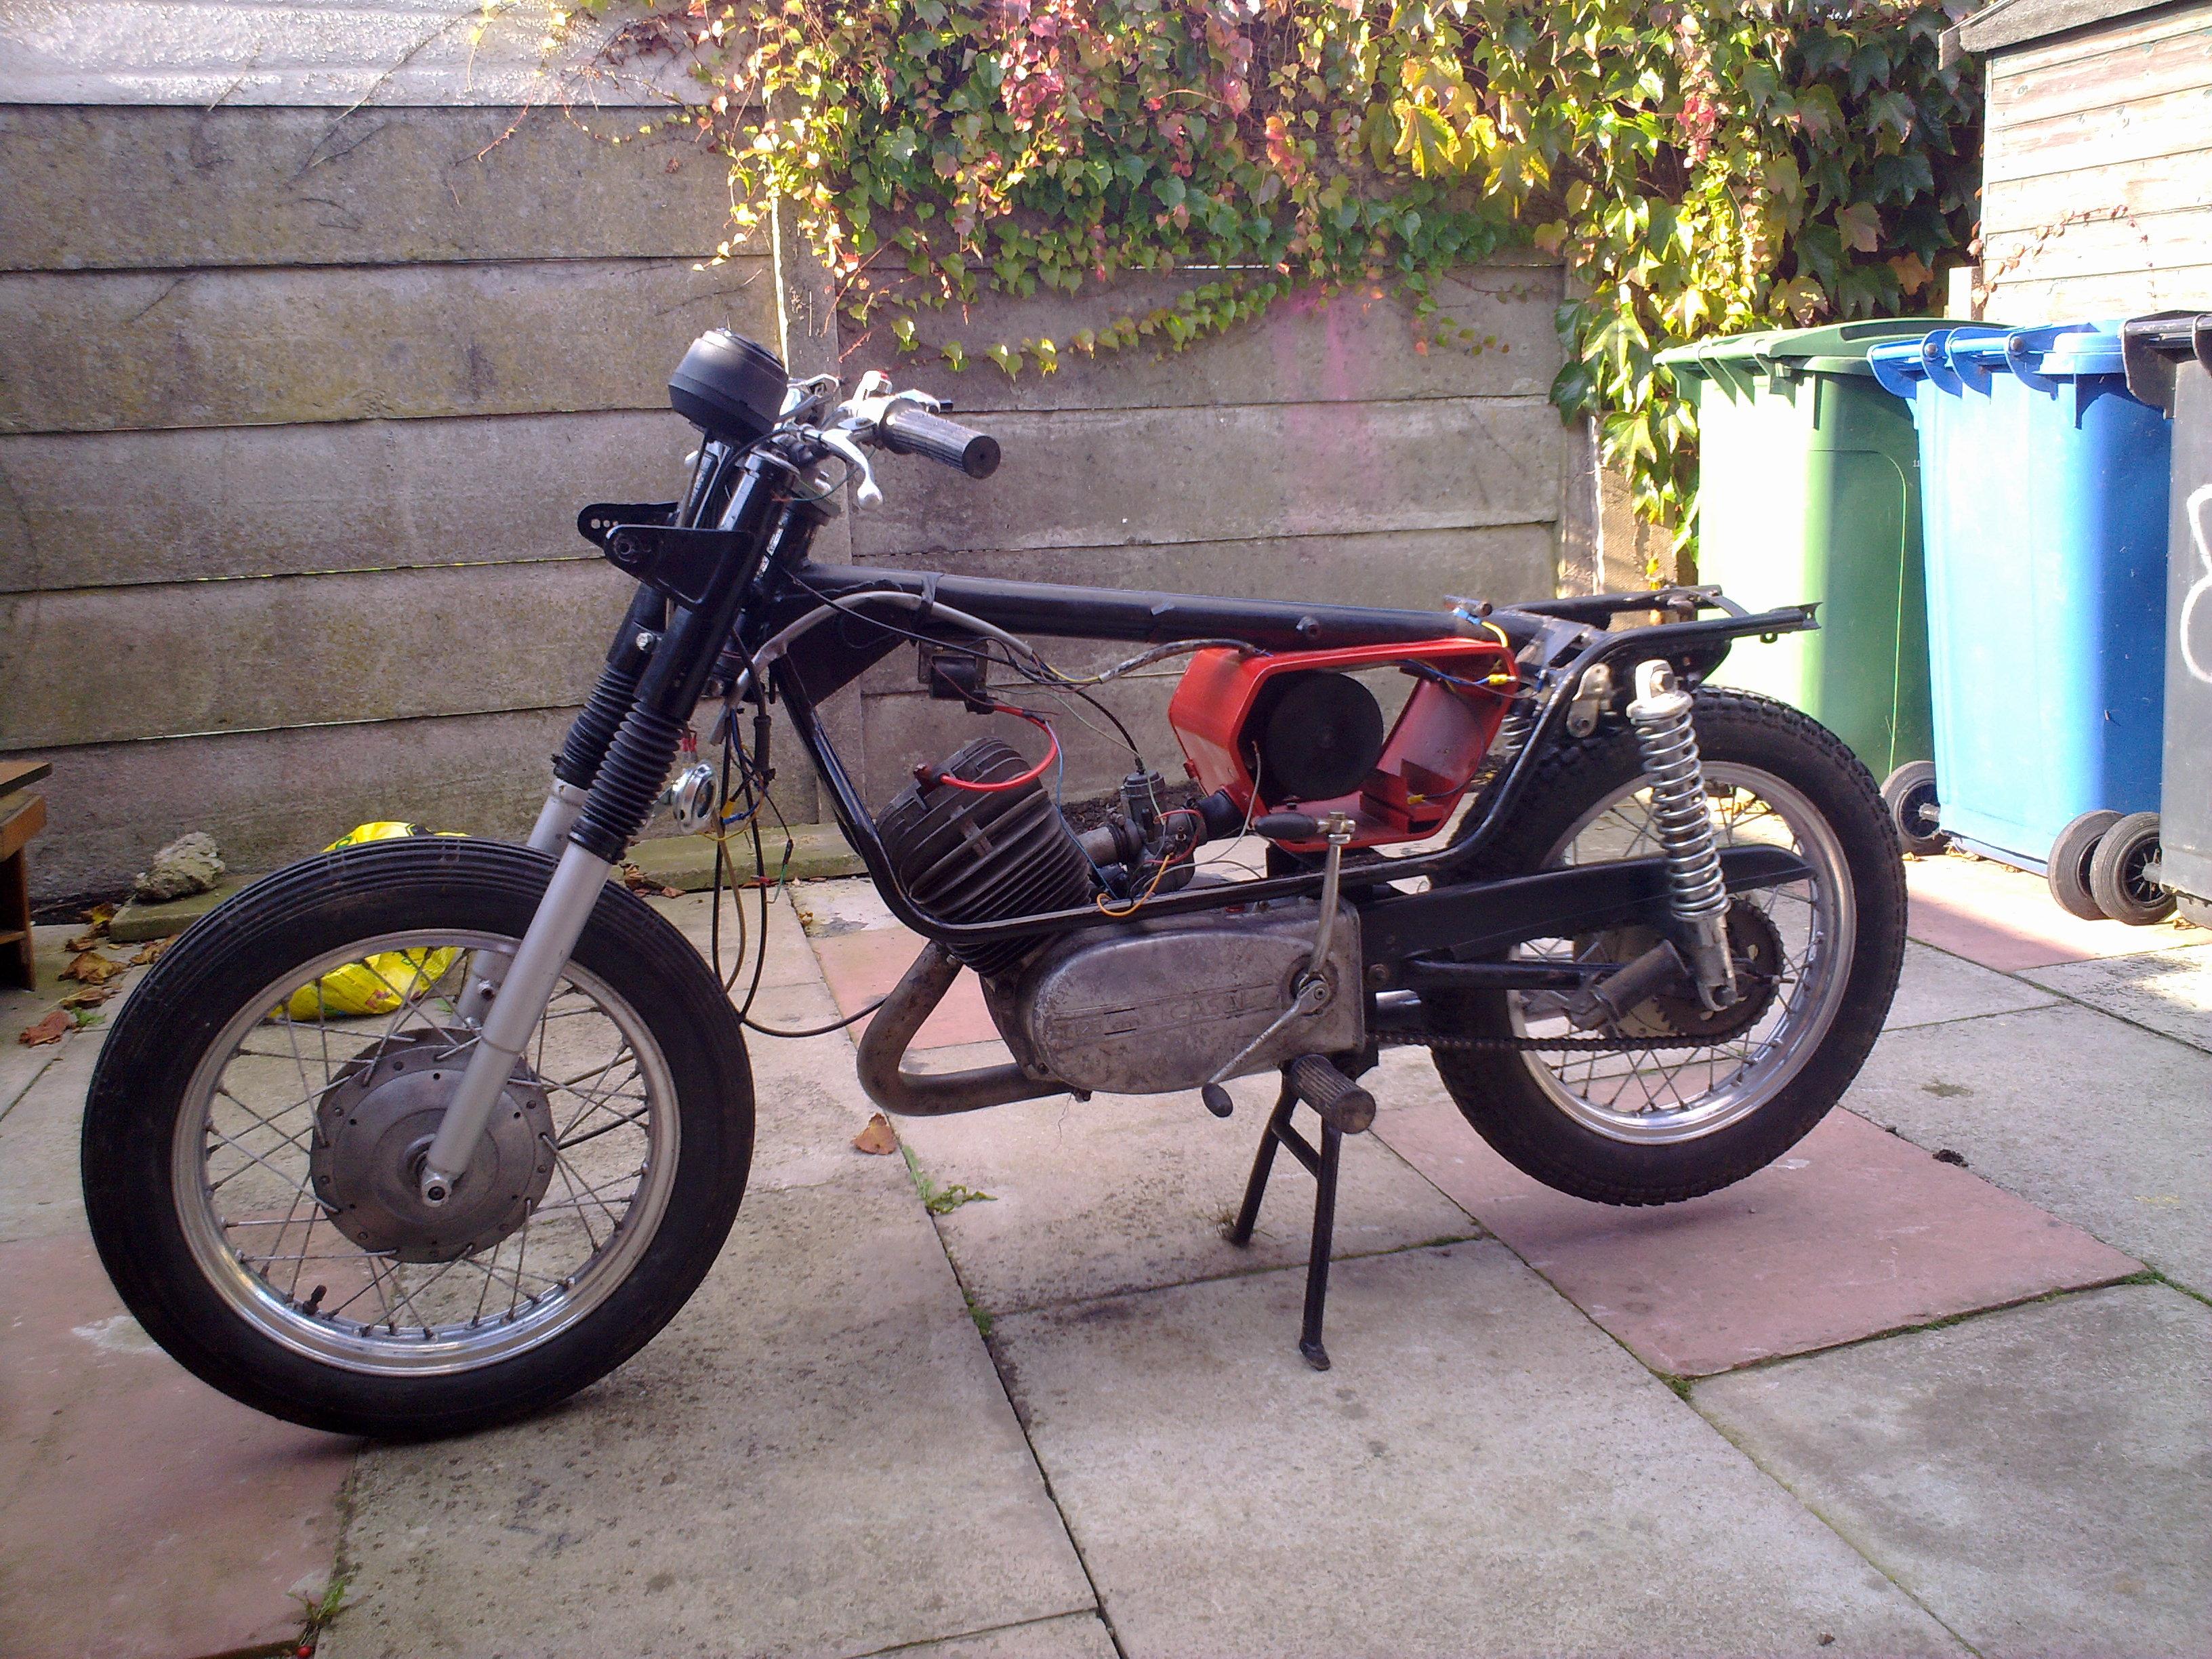 Rewiring A 1973 2 Stroke Motorcycle Motorcycle Forum